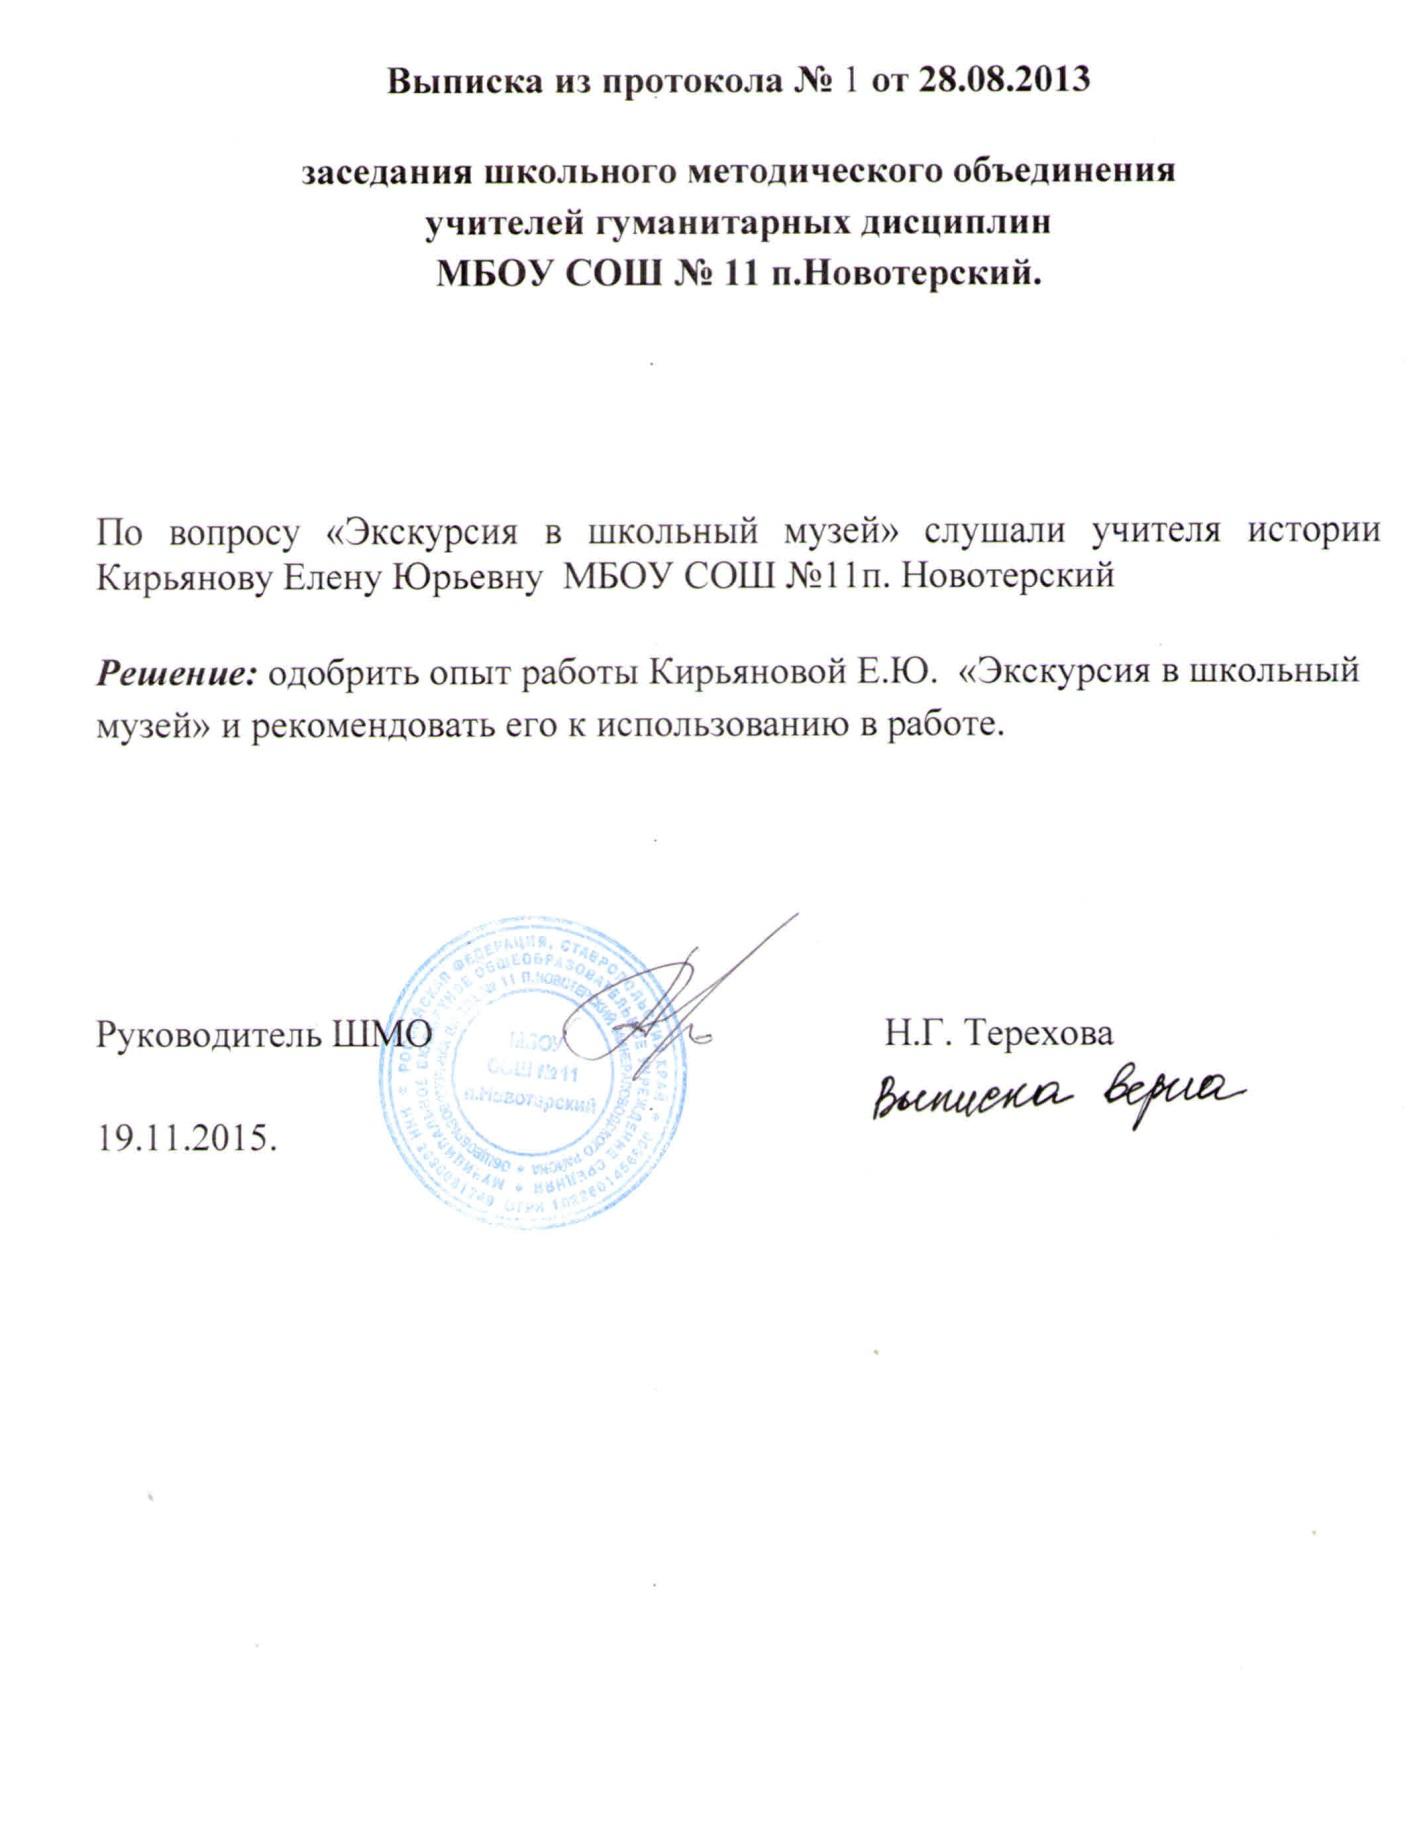 C:\Users\Сергей\Desktop\шмо\Document_9.jpg